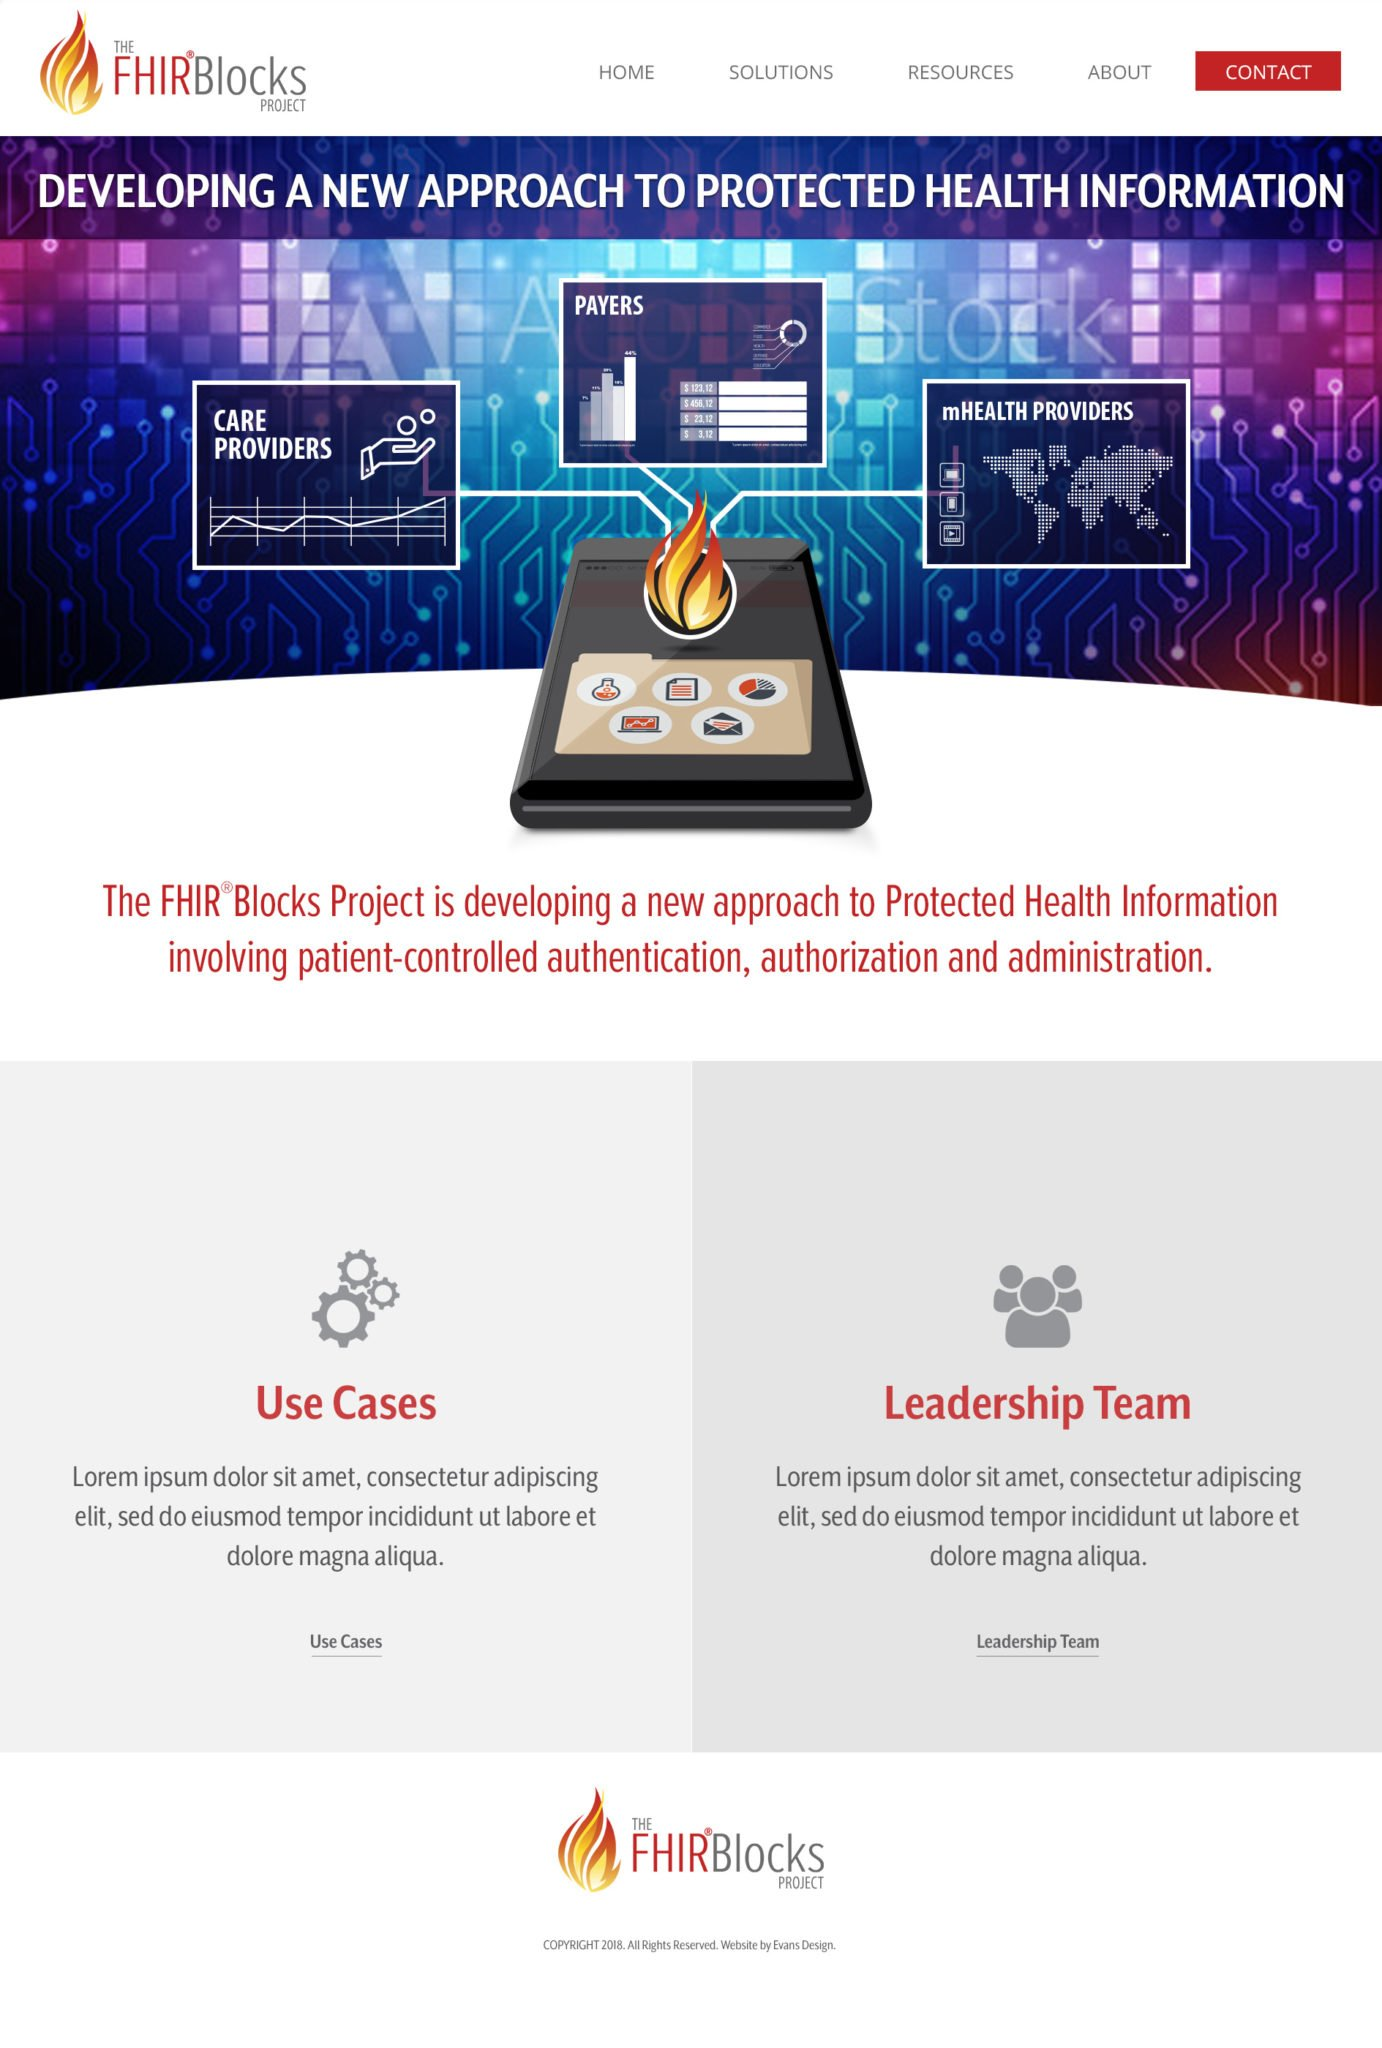 FHIR Blocks Healthcare Website Design